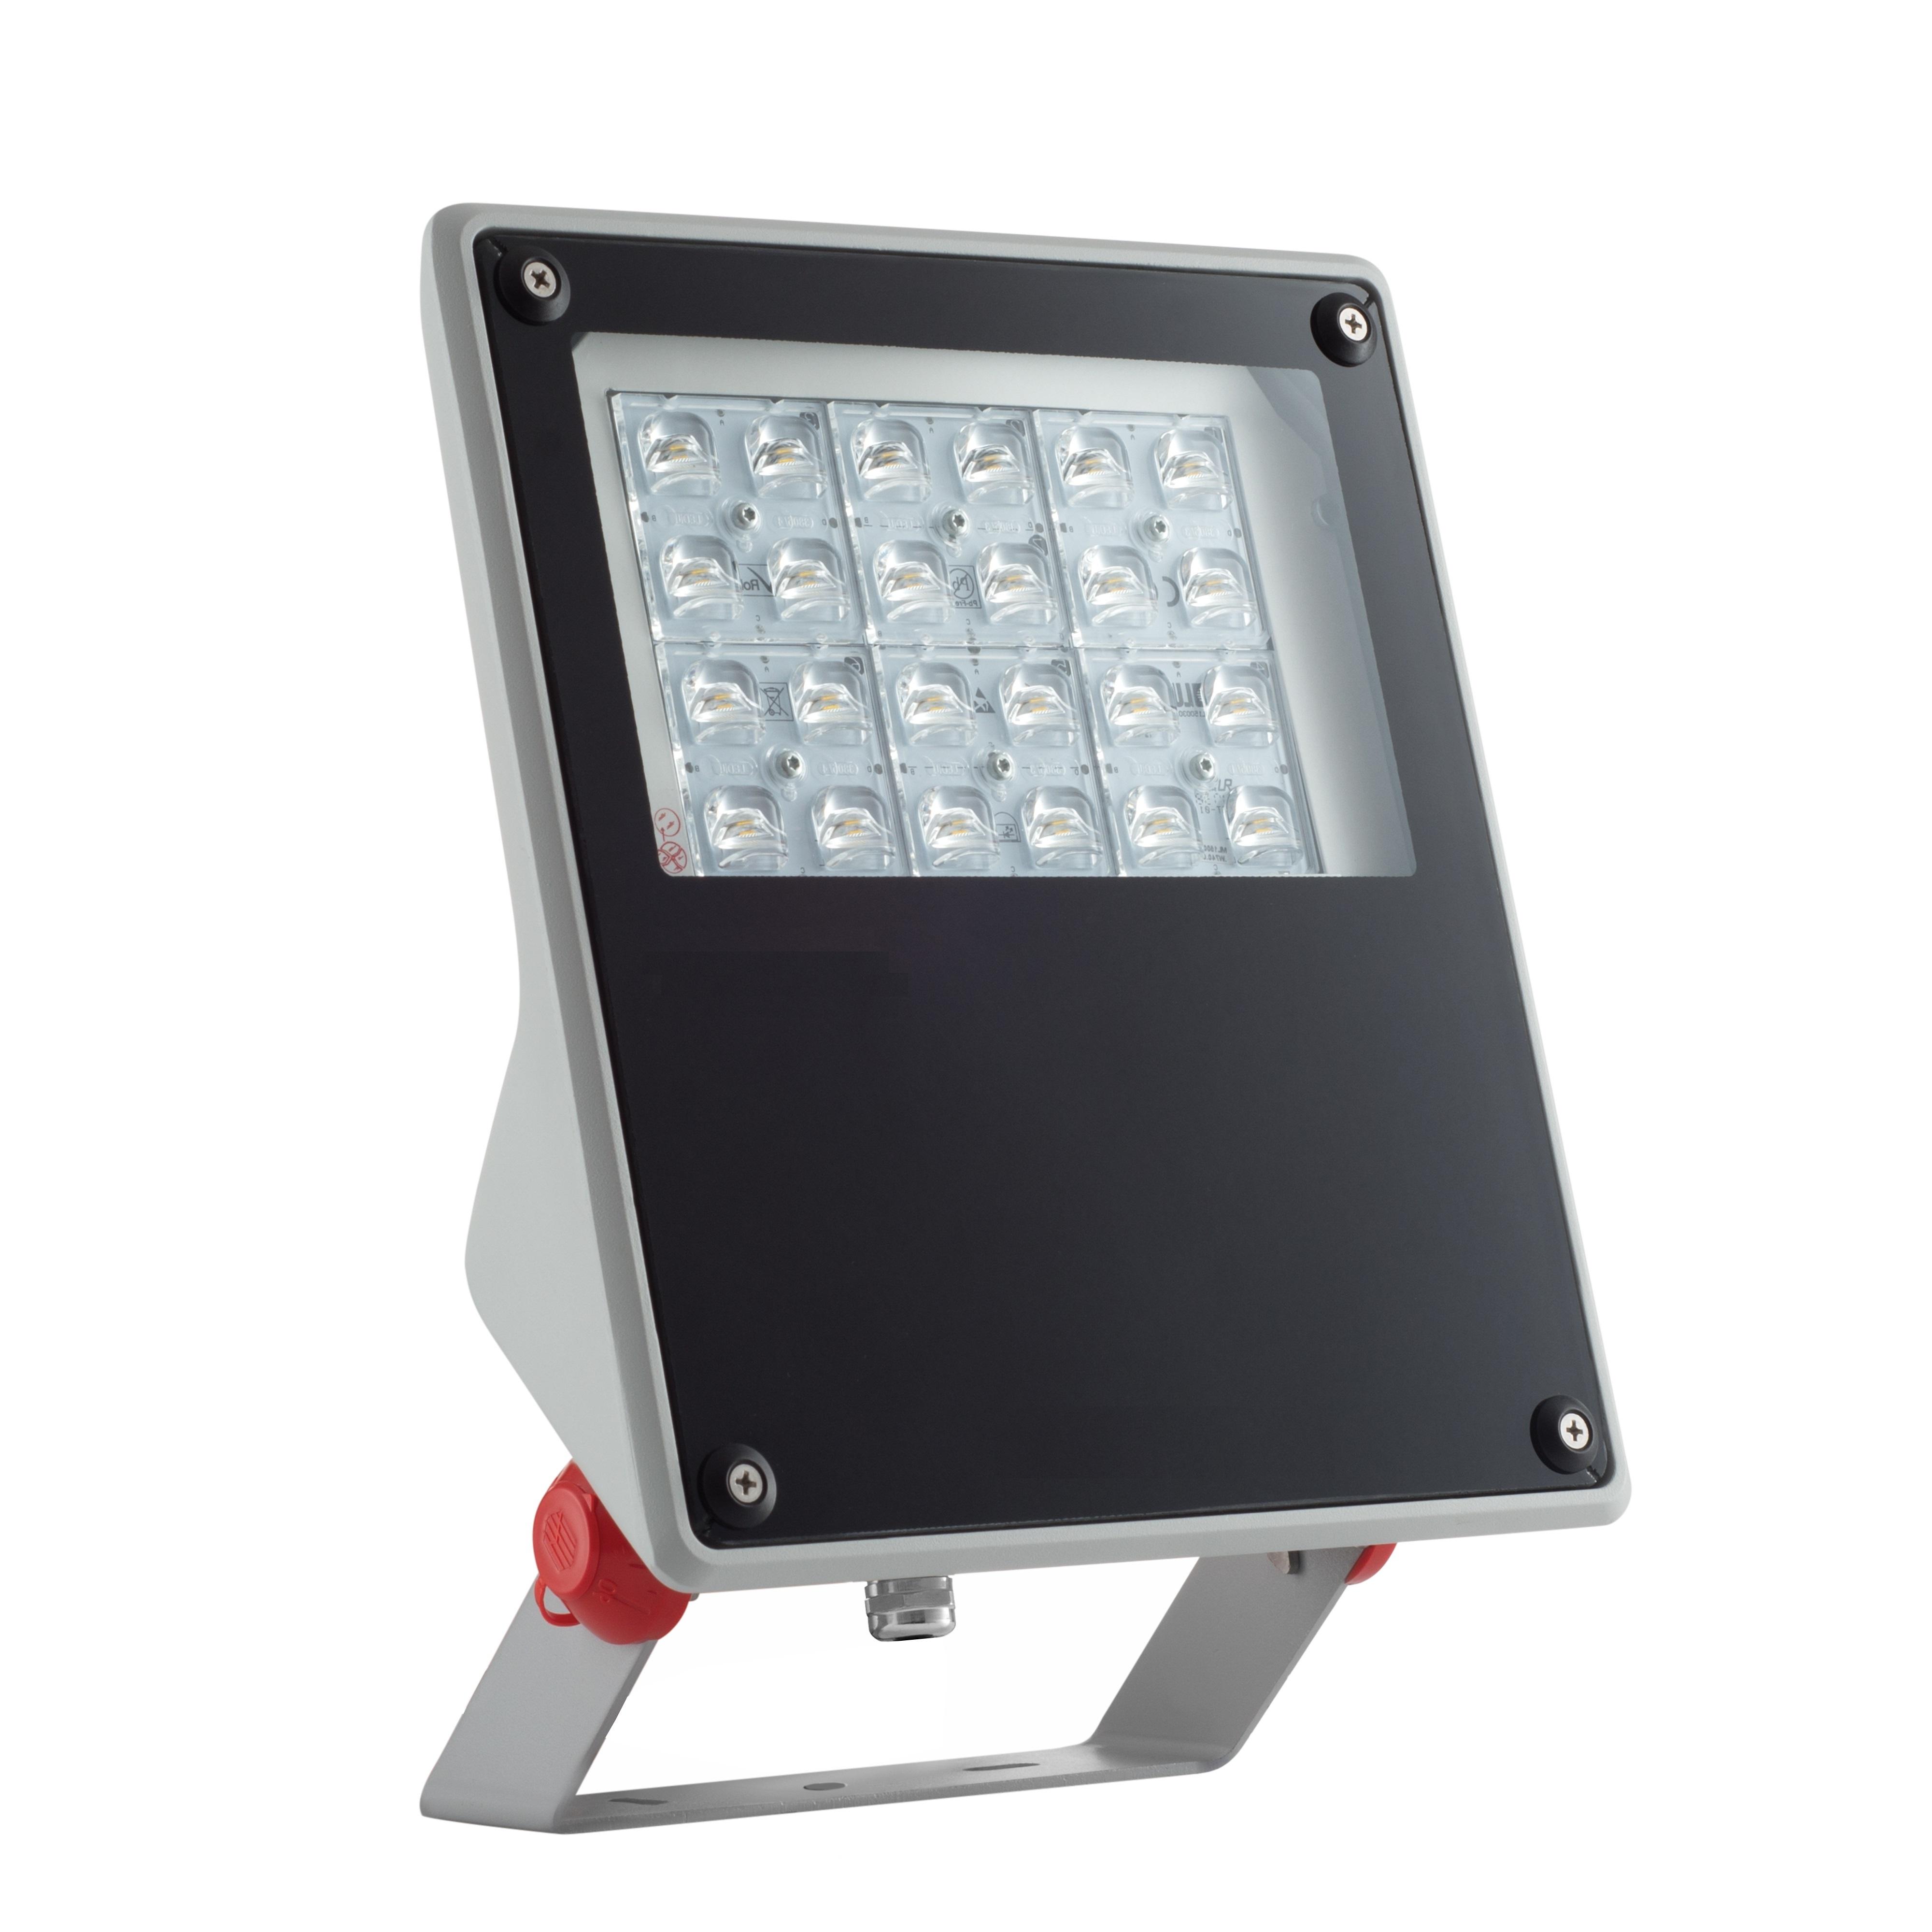 1 Stk FORCA LED Mini 27W 3250lm 4000K EVG IP65 25?symmetrisch grau LIG5L01111